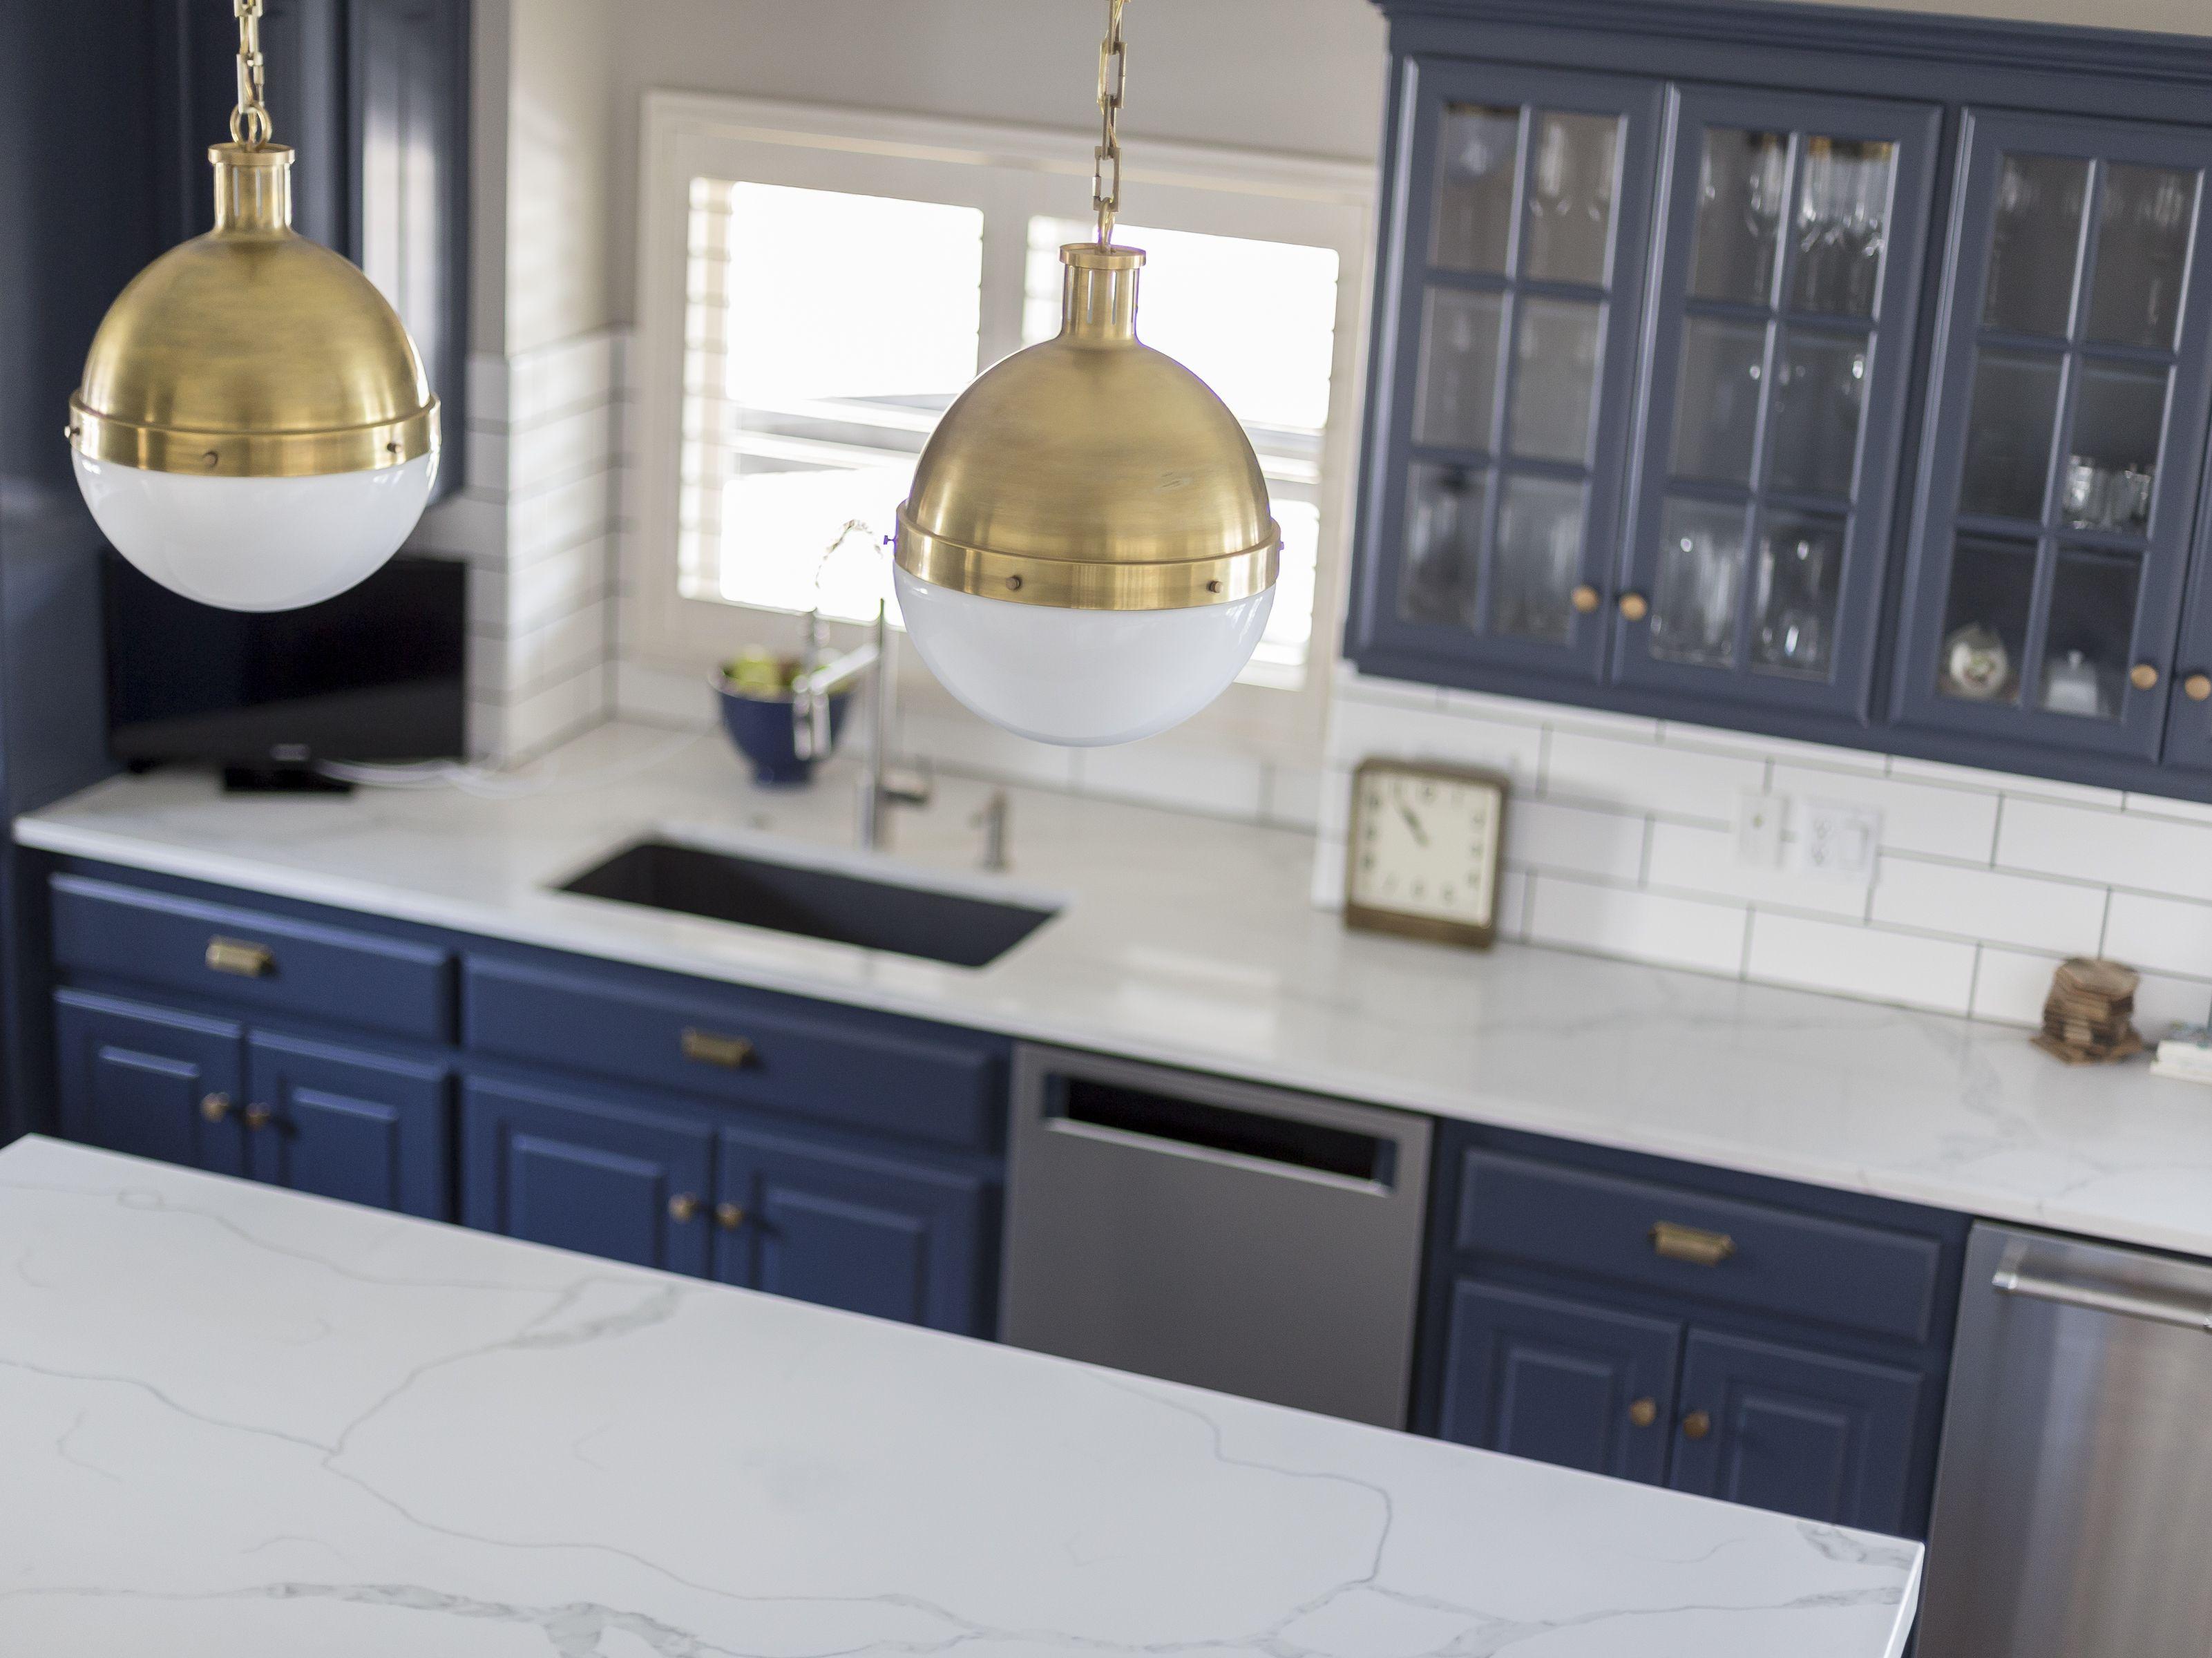 Bm Hale Navy Kitchen Cabinets Kitchen Remodel Kitchen Remodel Small Cape Cod Kitchen Remodel